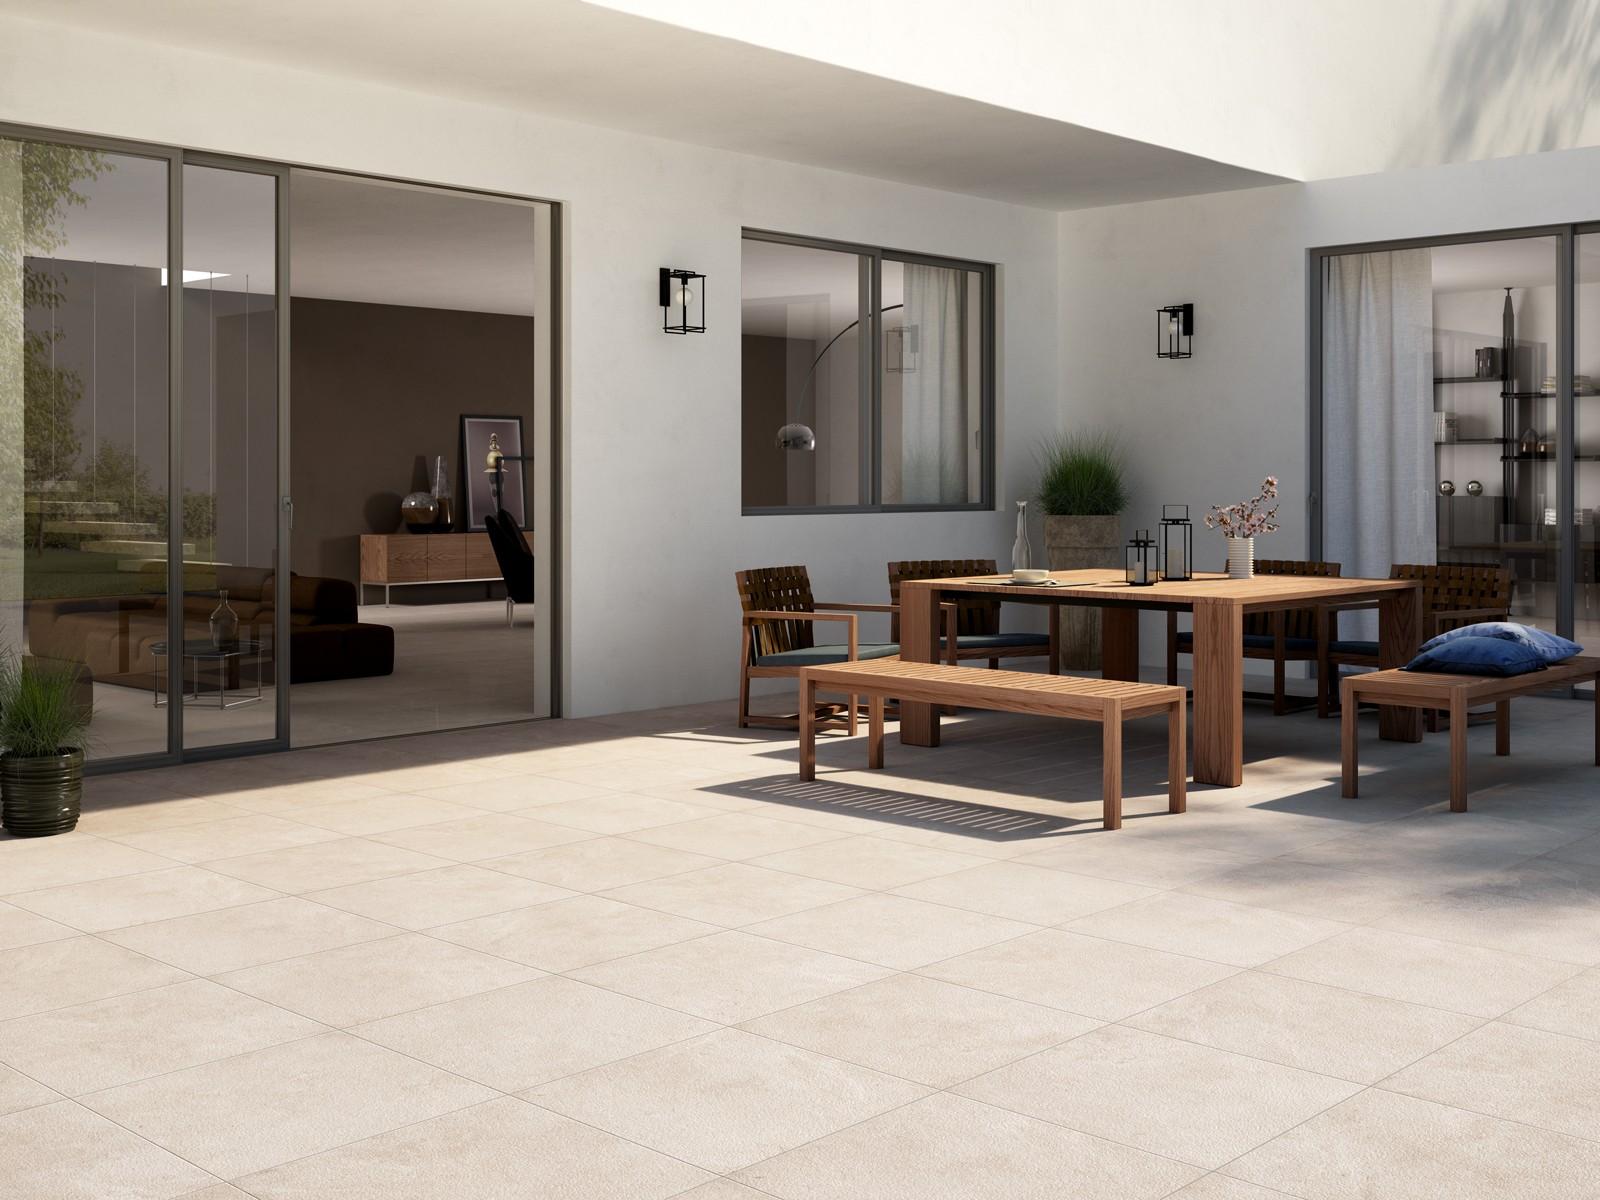 archistone limestone crema grip rett nat 60x60 20mm bq. Black Bedroom Furniture Sets. Home Design Ideas